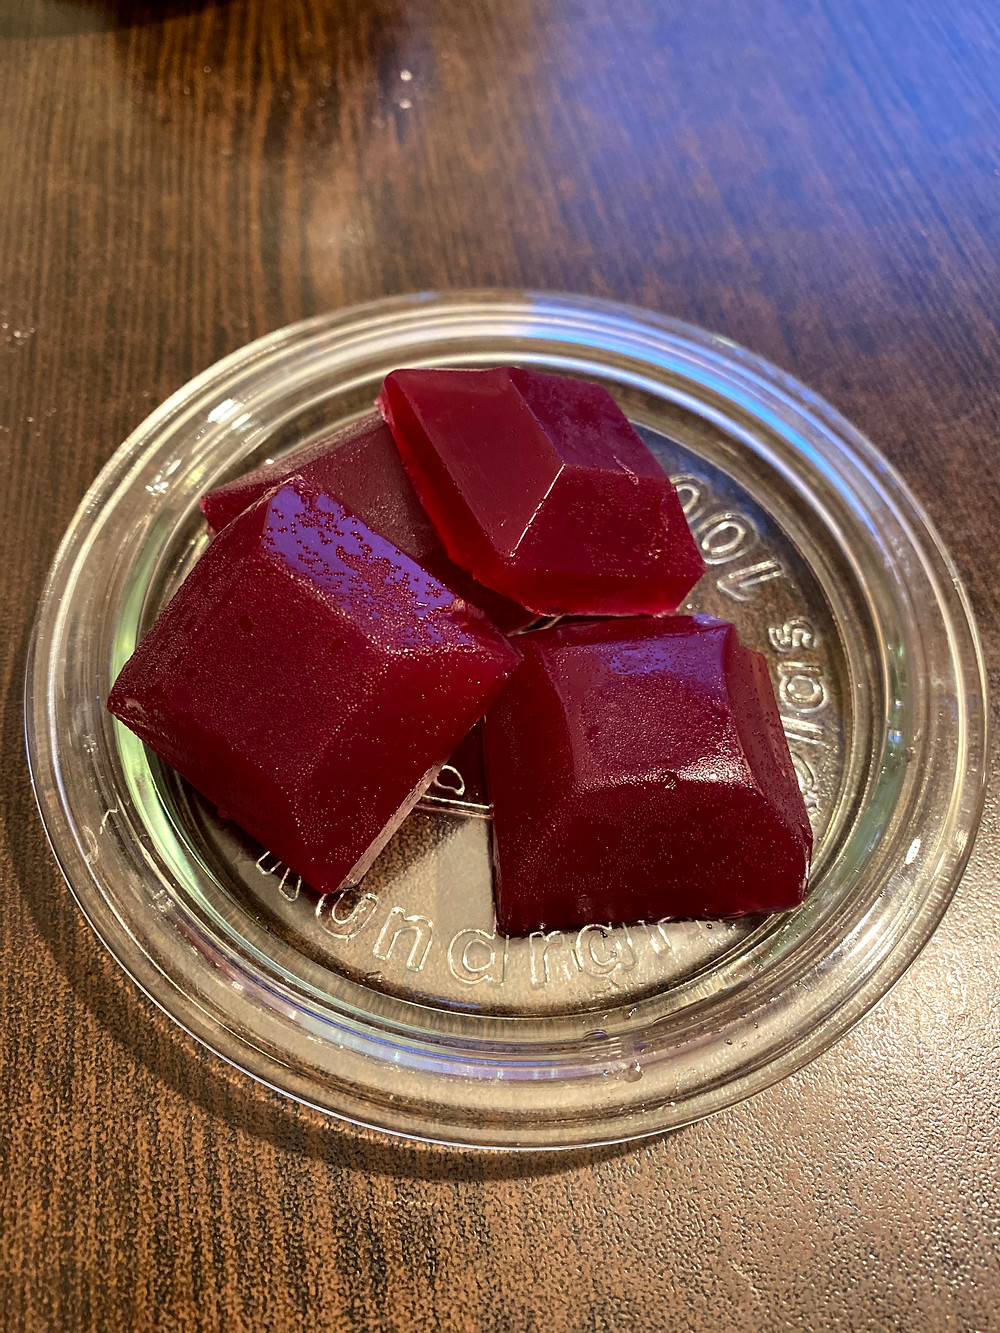 Gluehwein jelly